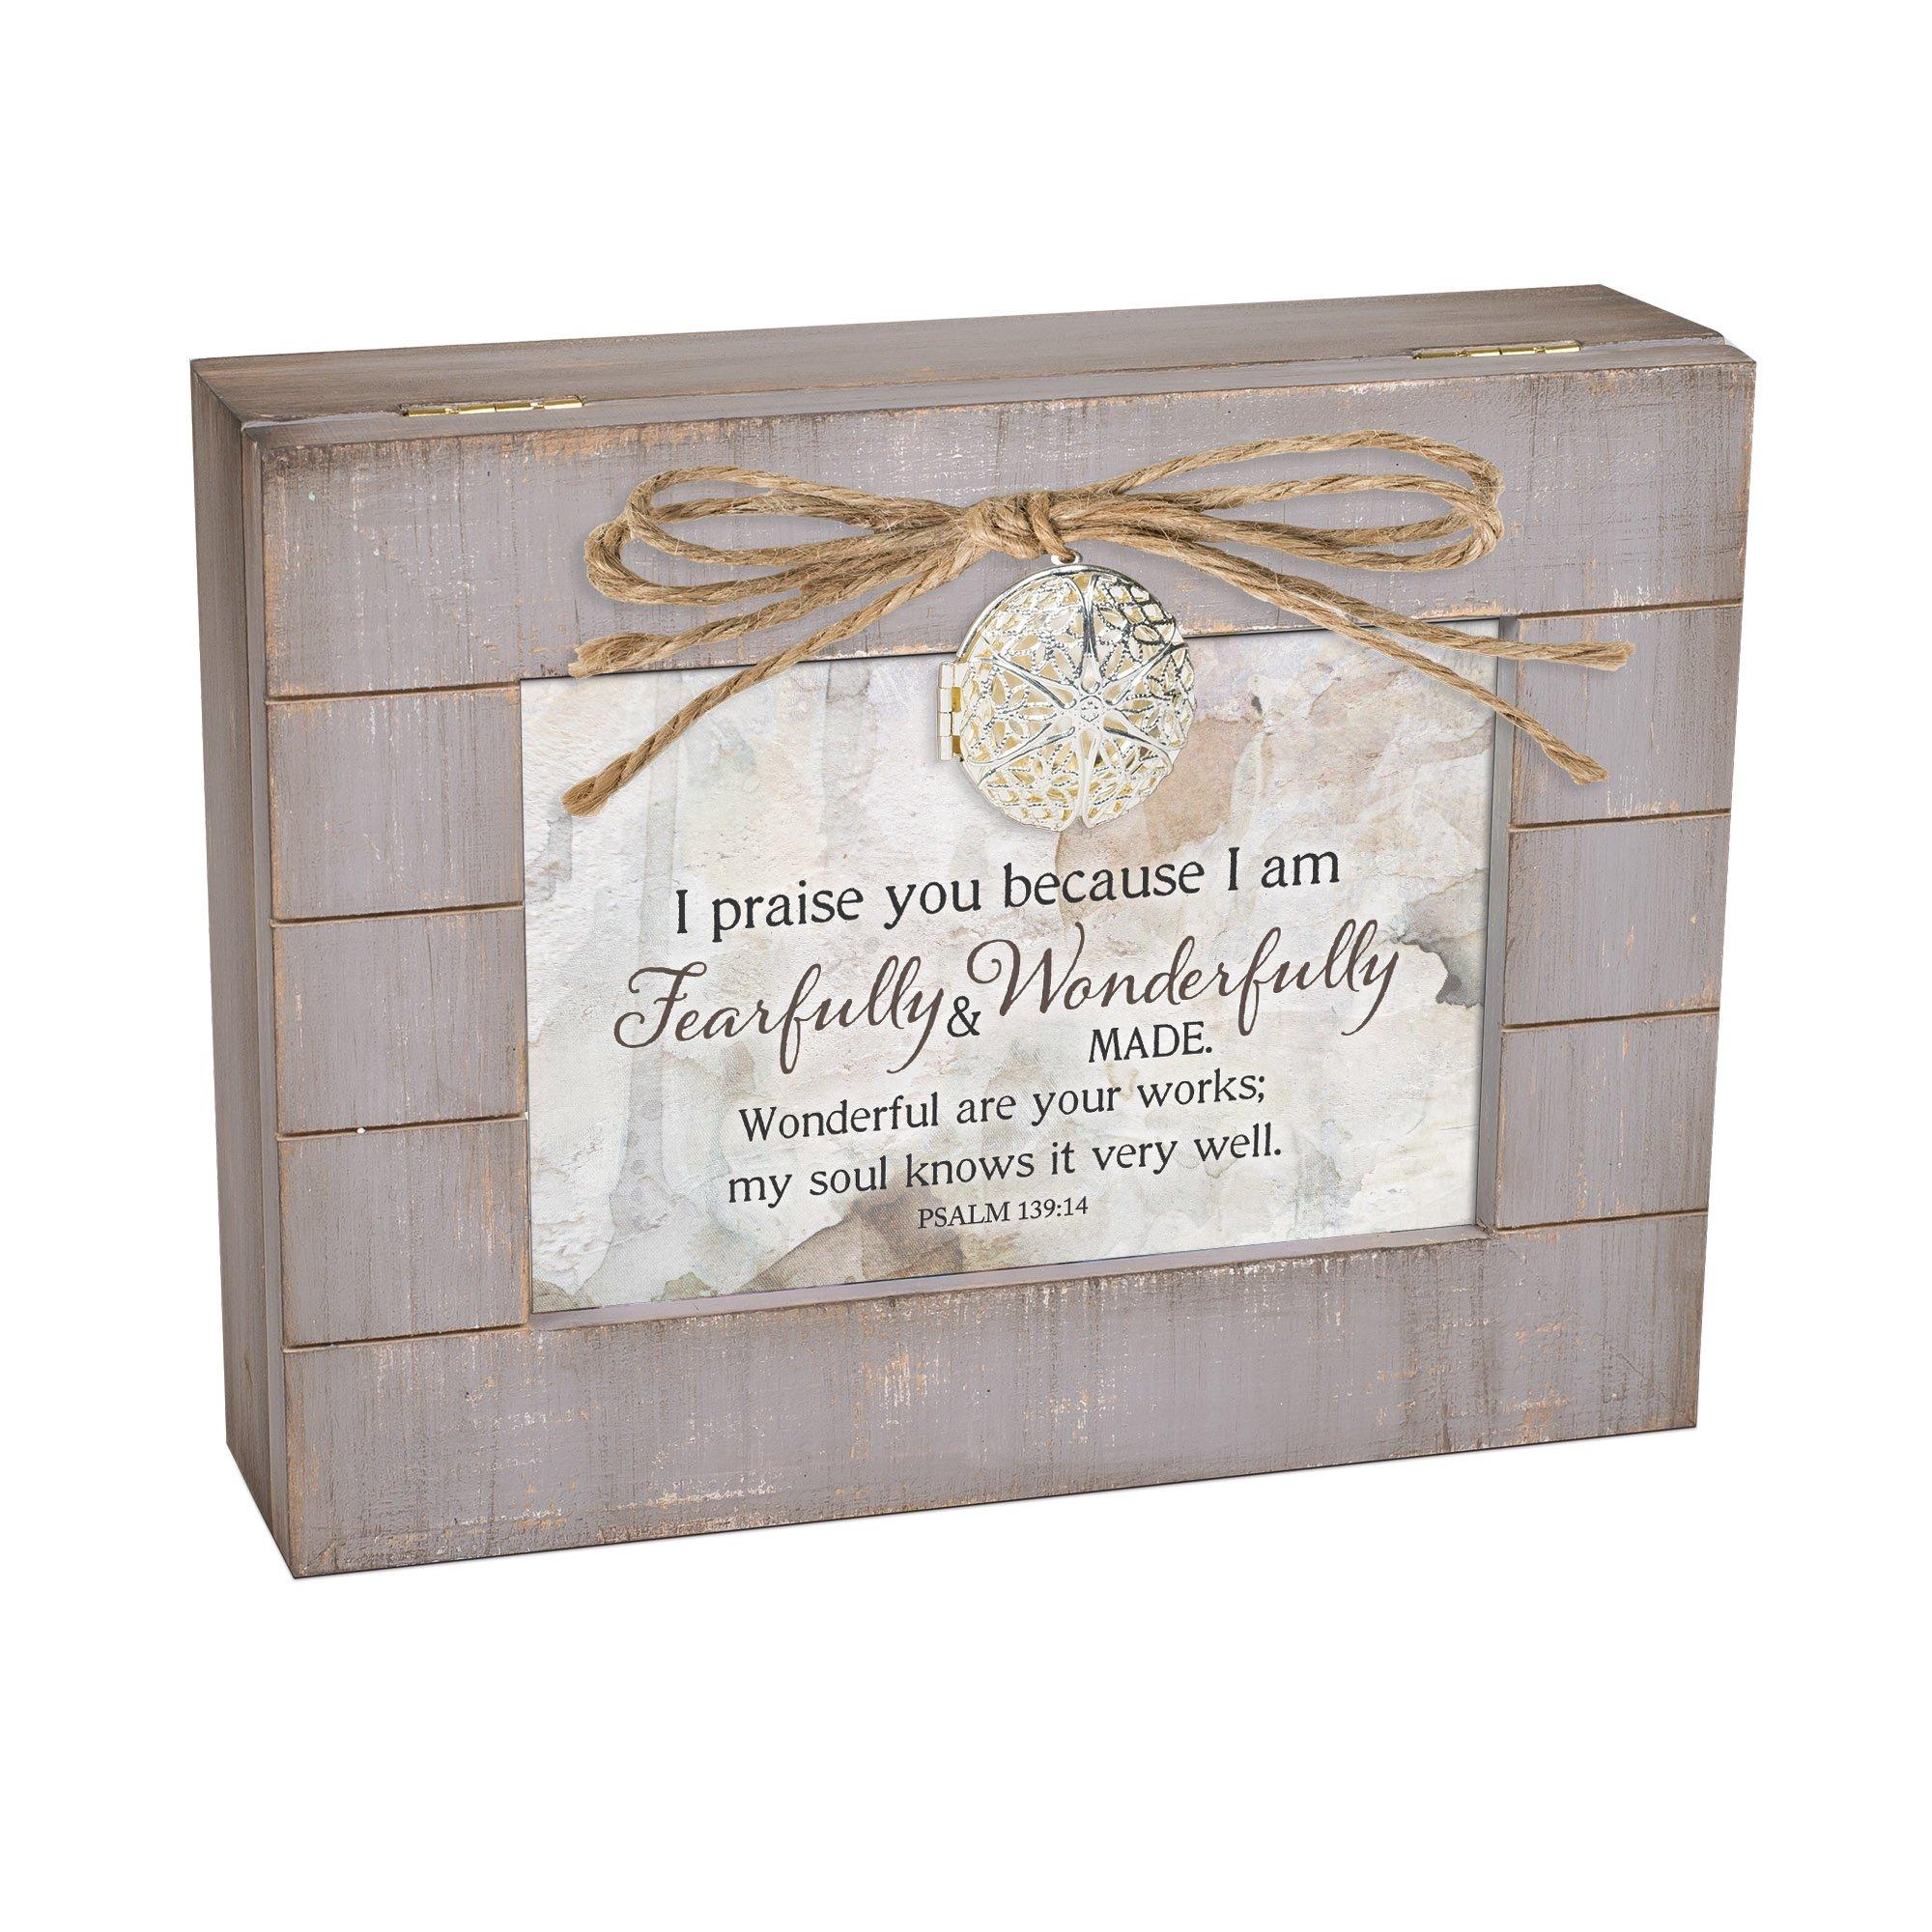 Cottage Garden Fearfully Wonderfully Made Grey Distressed Locket Music Box Plays Amazing Grace